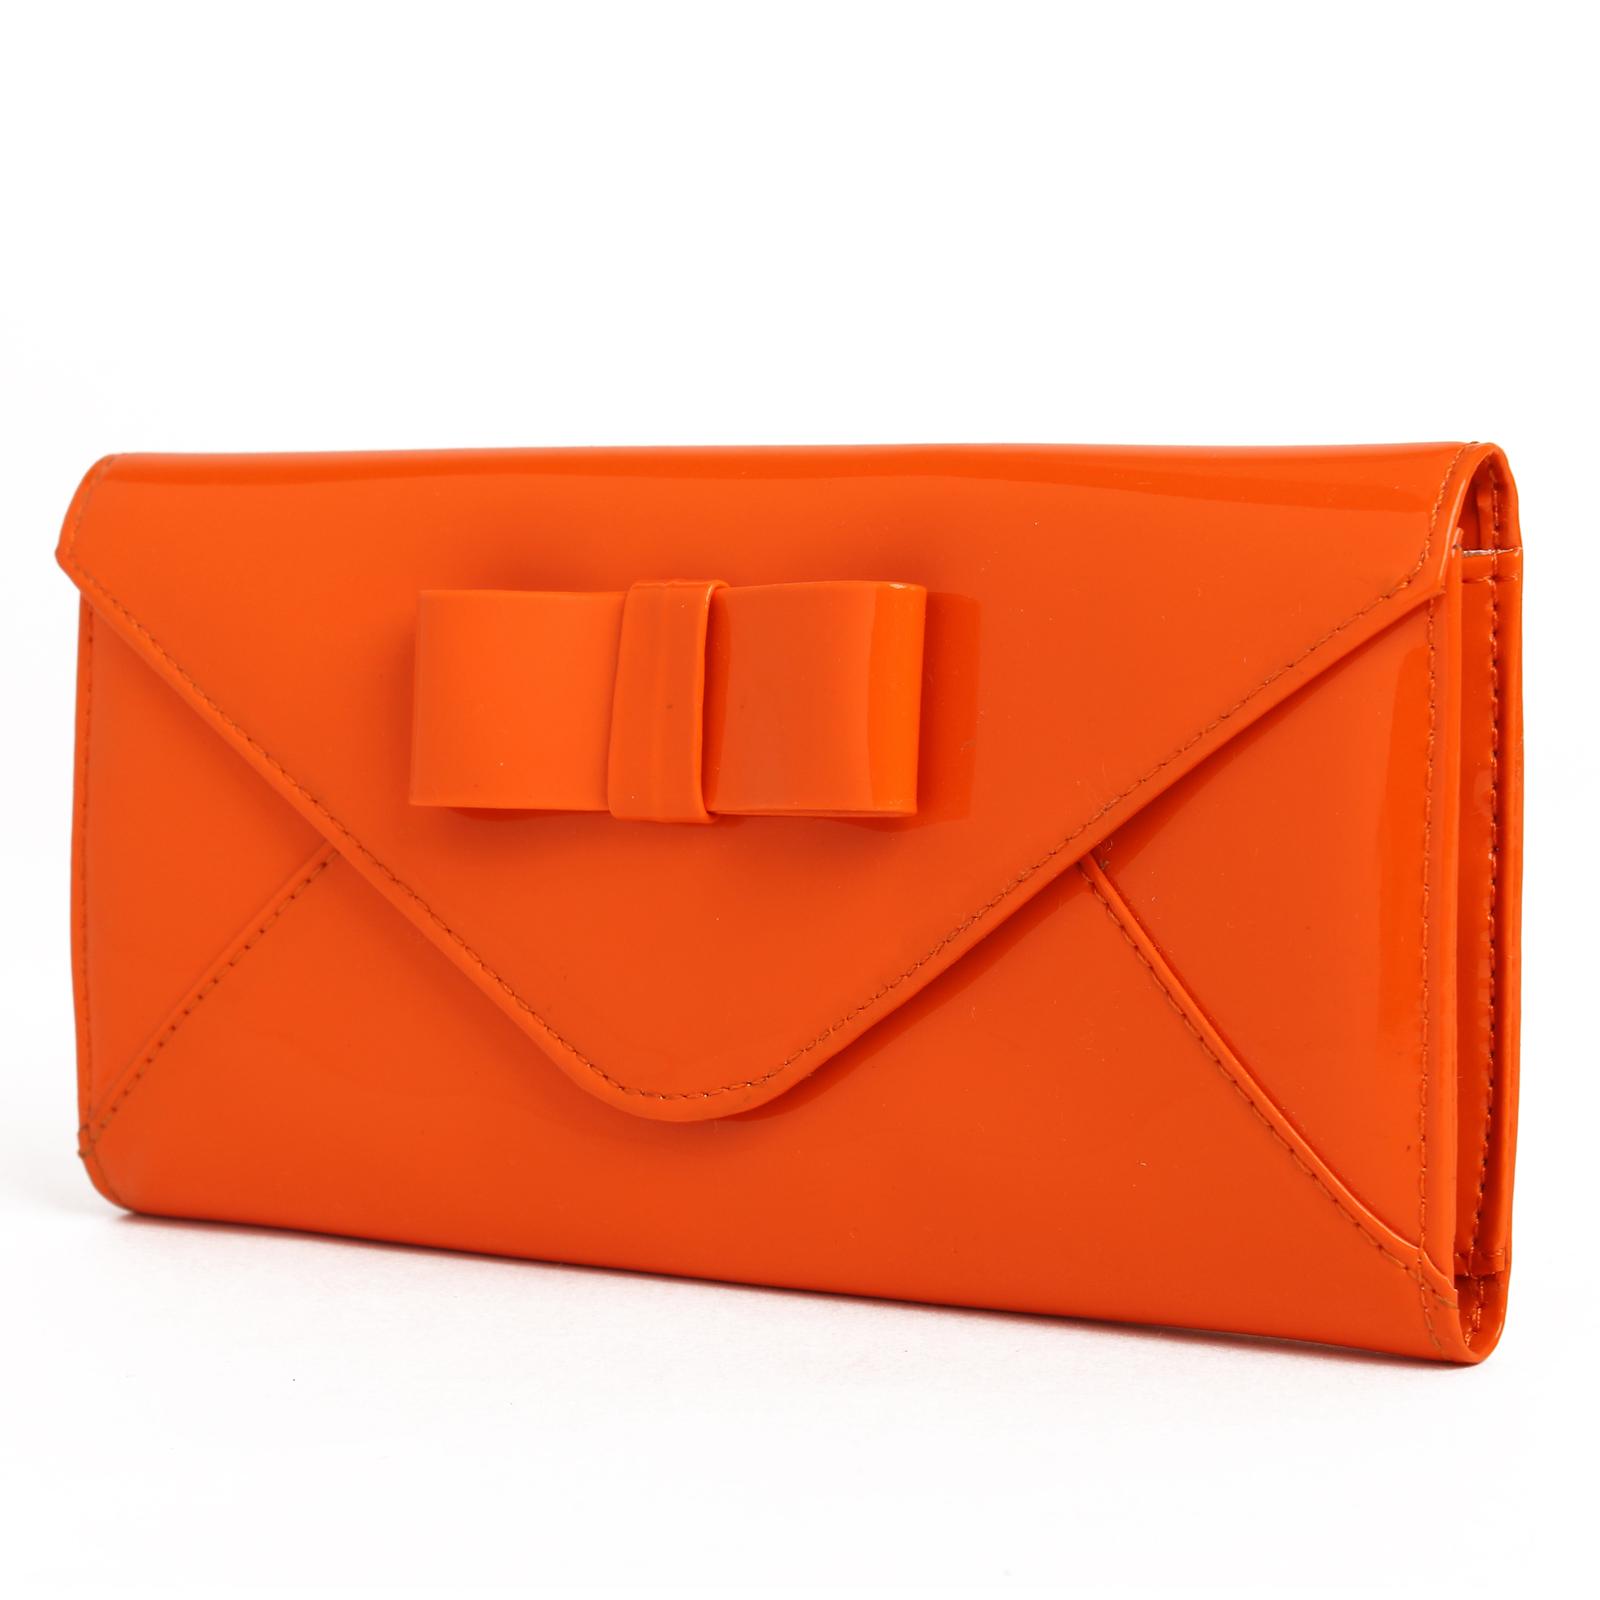 Leady Patent PU Leather Bowknot Envelope Clutch Handbag Women Bag Evening Purse(China (Mainland))